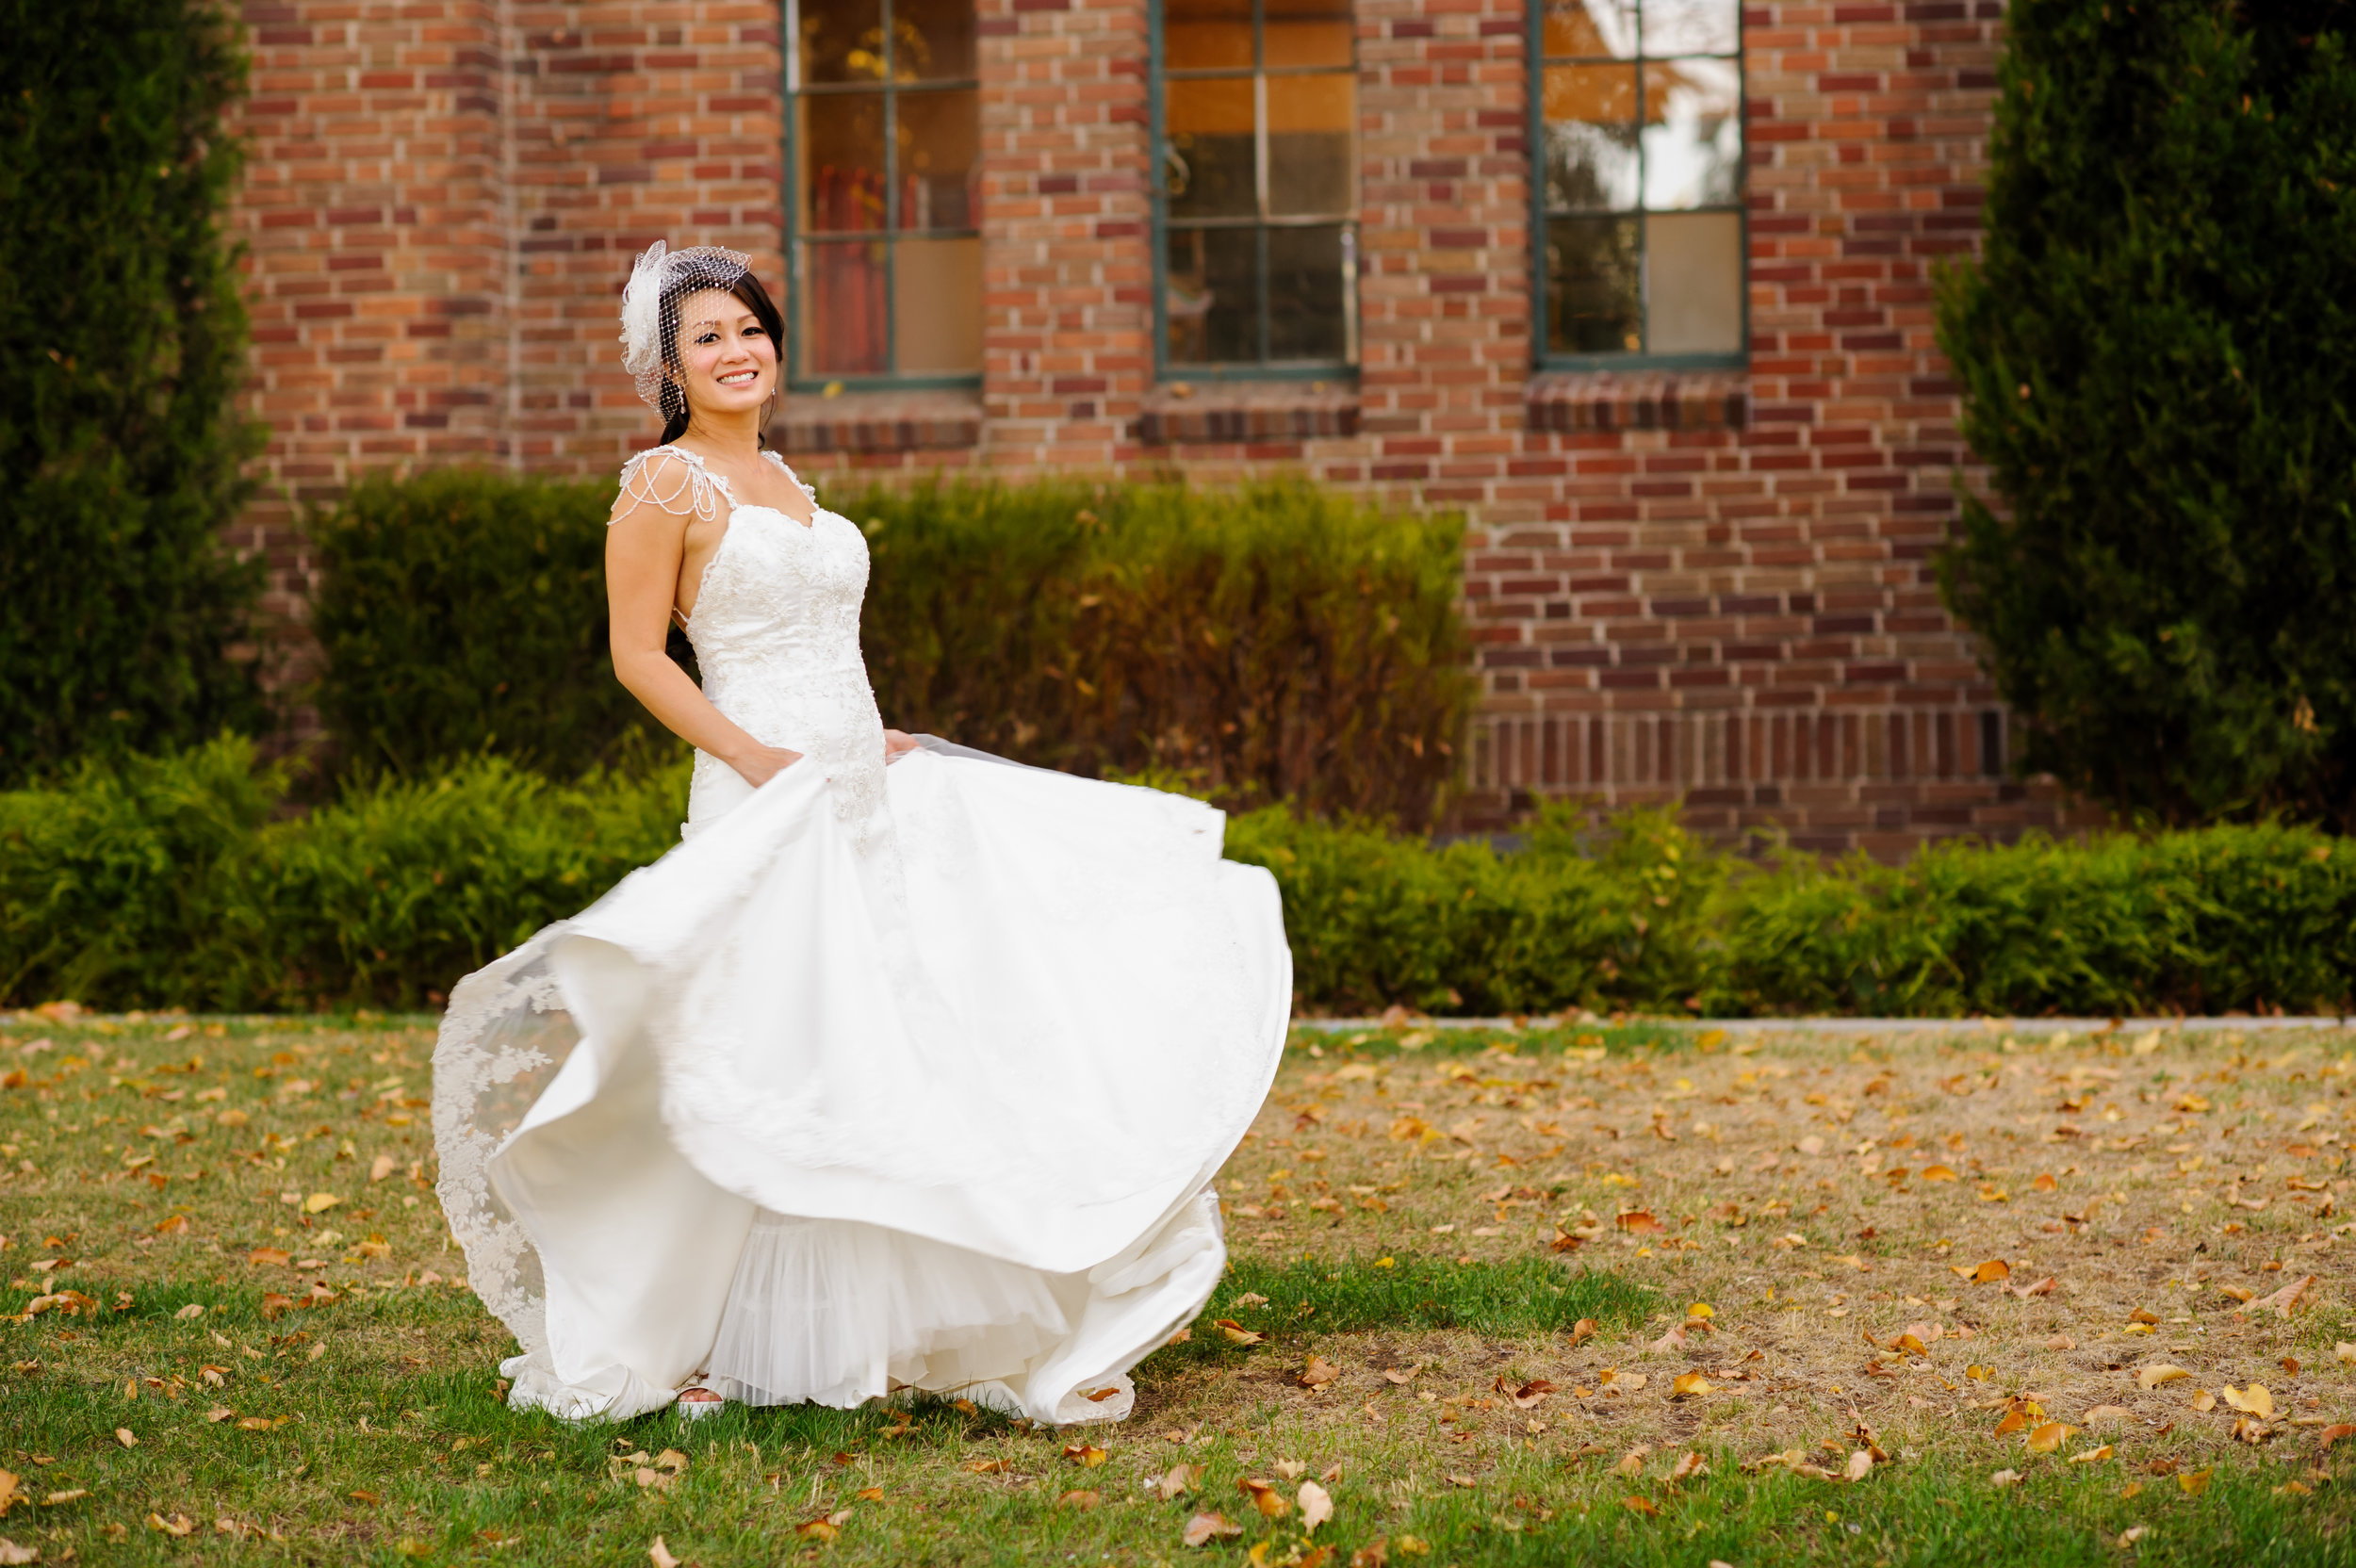 camilla-thuy-068-memorial-auditorium-sacramento-wedding-photographer-katherine-nicole-photography.JPG